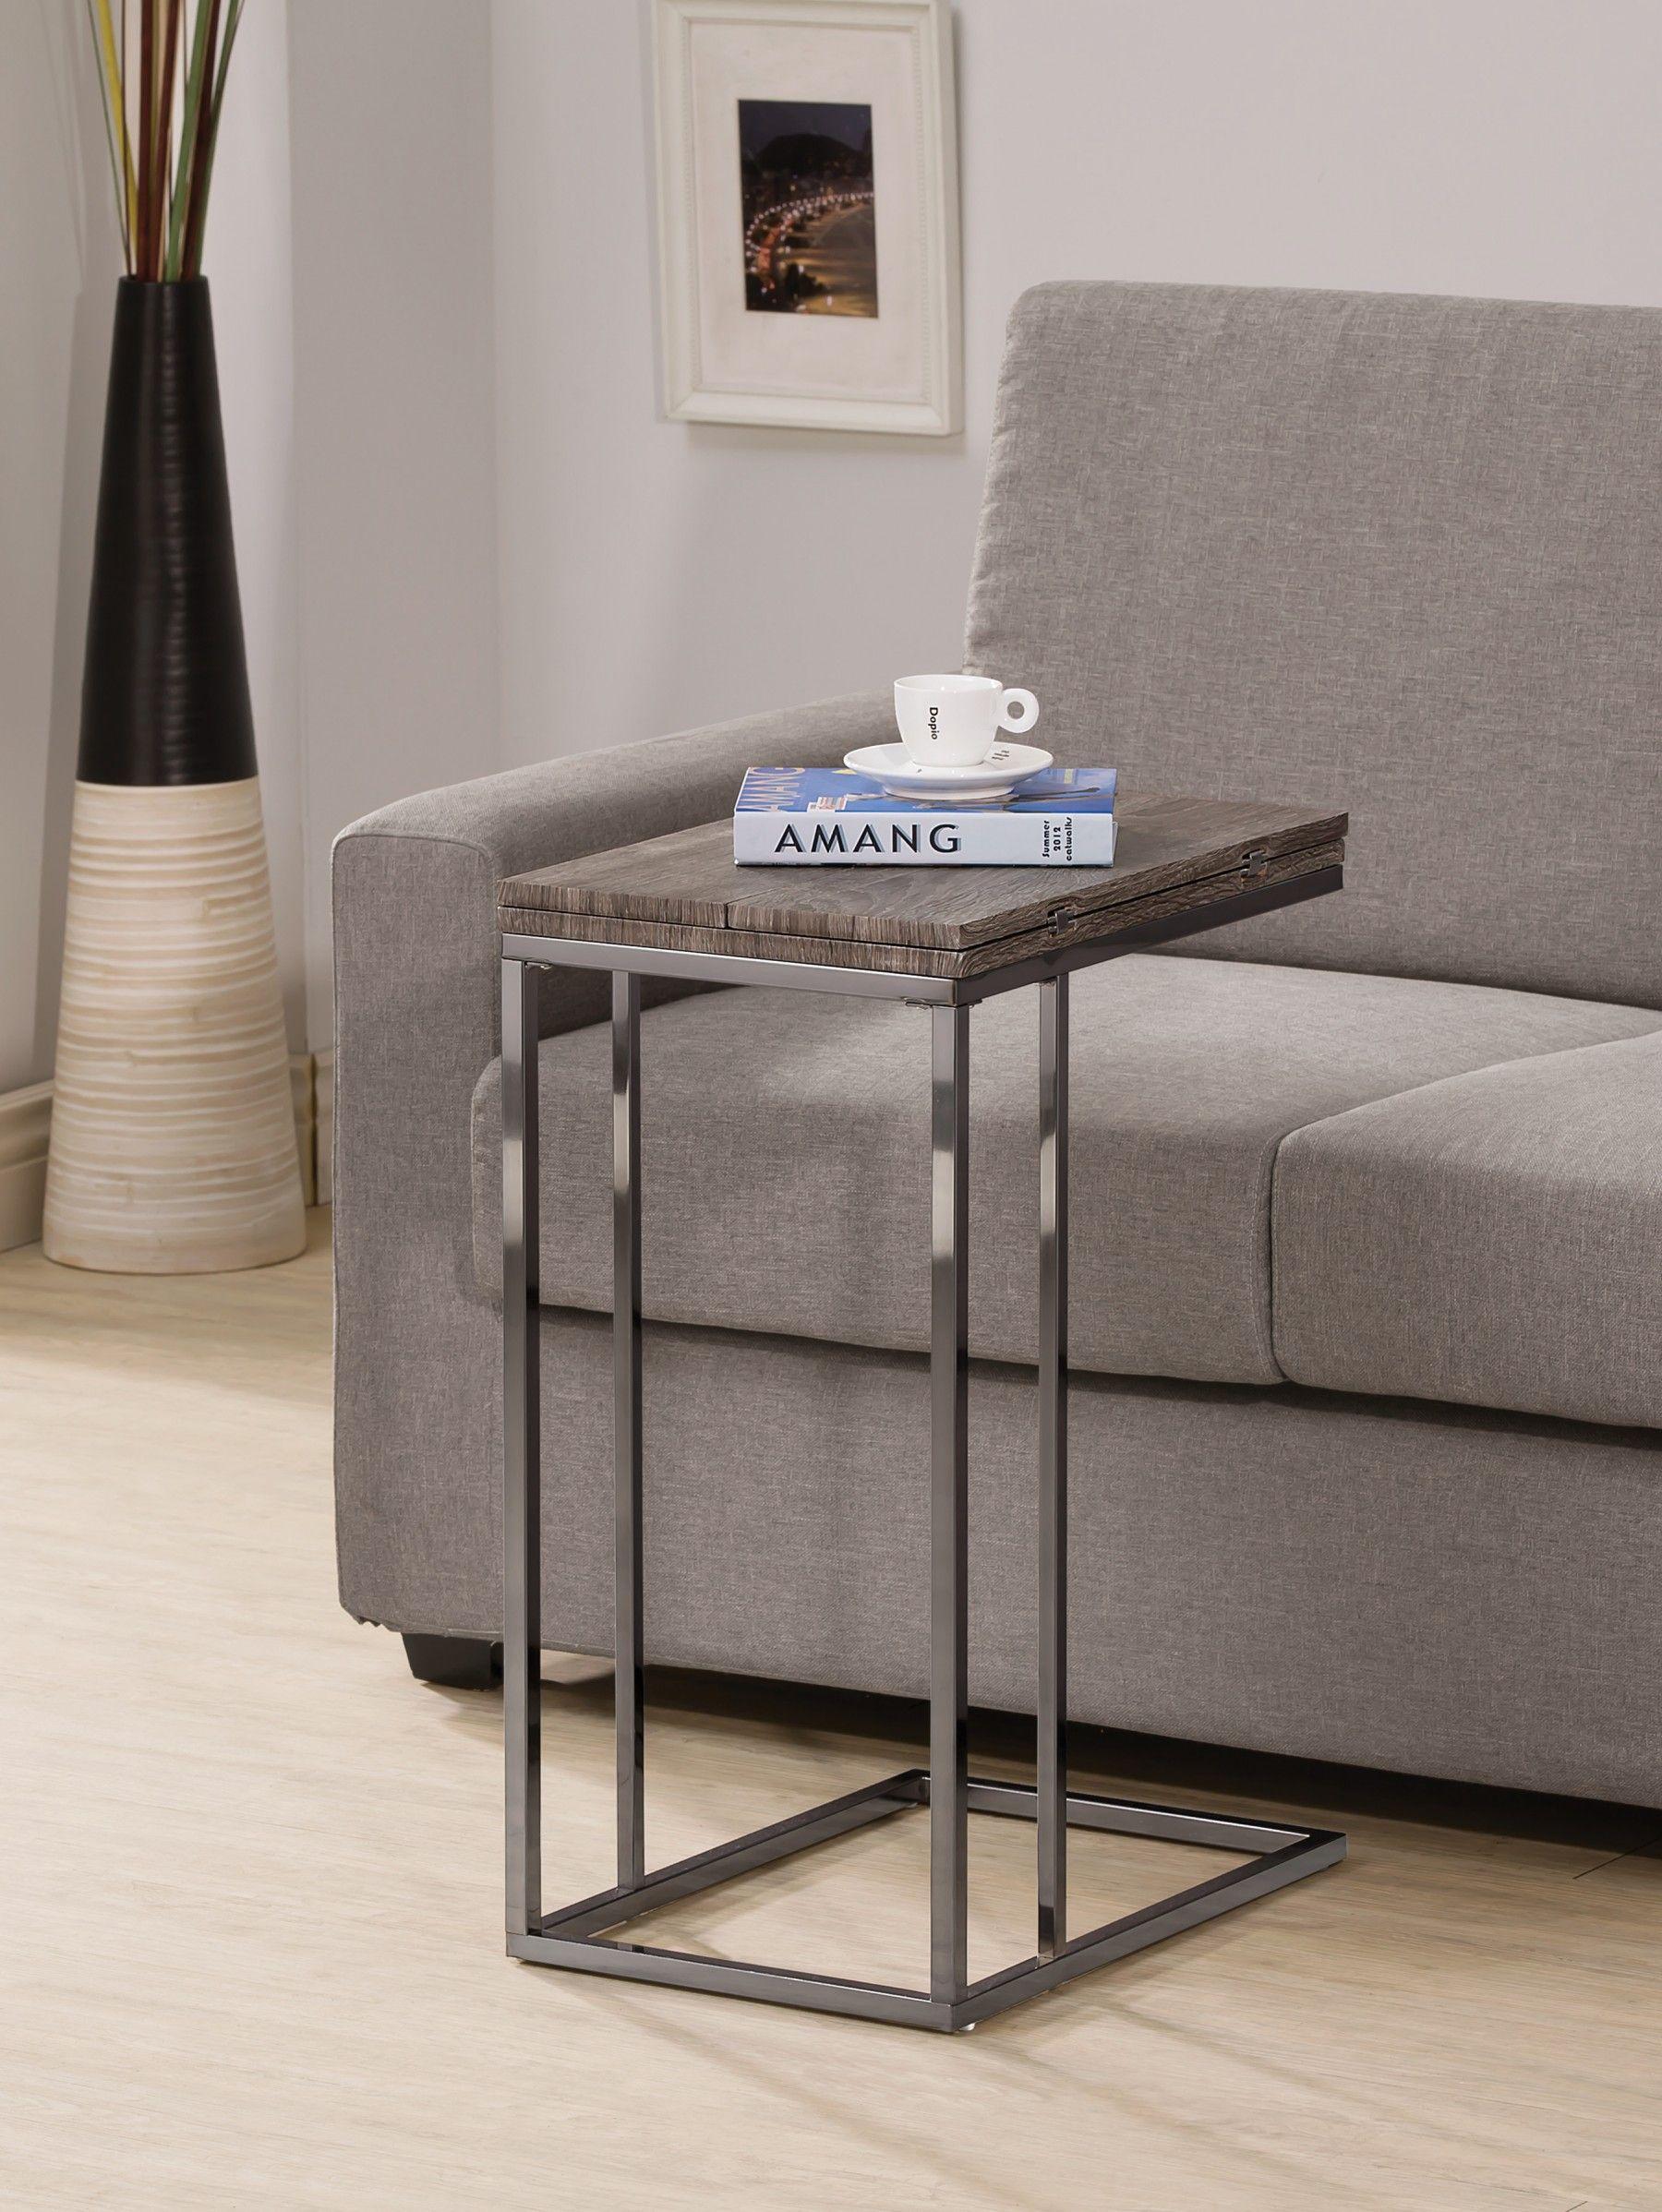 Astonishing Snack Table 902864 Rectangle Weathered Grey Folding Snack Short Links Chair Design For Home Short Linksinfo